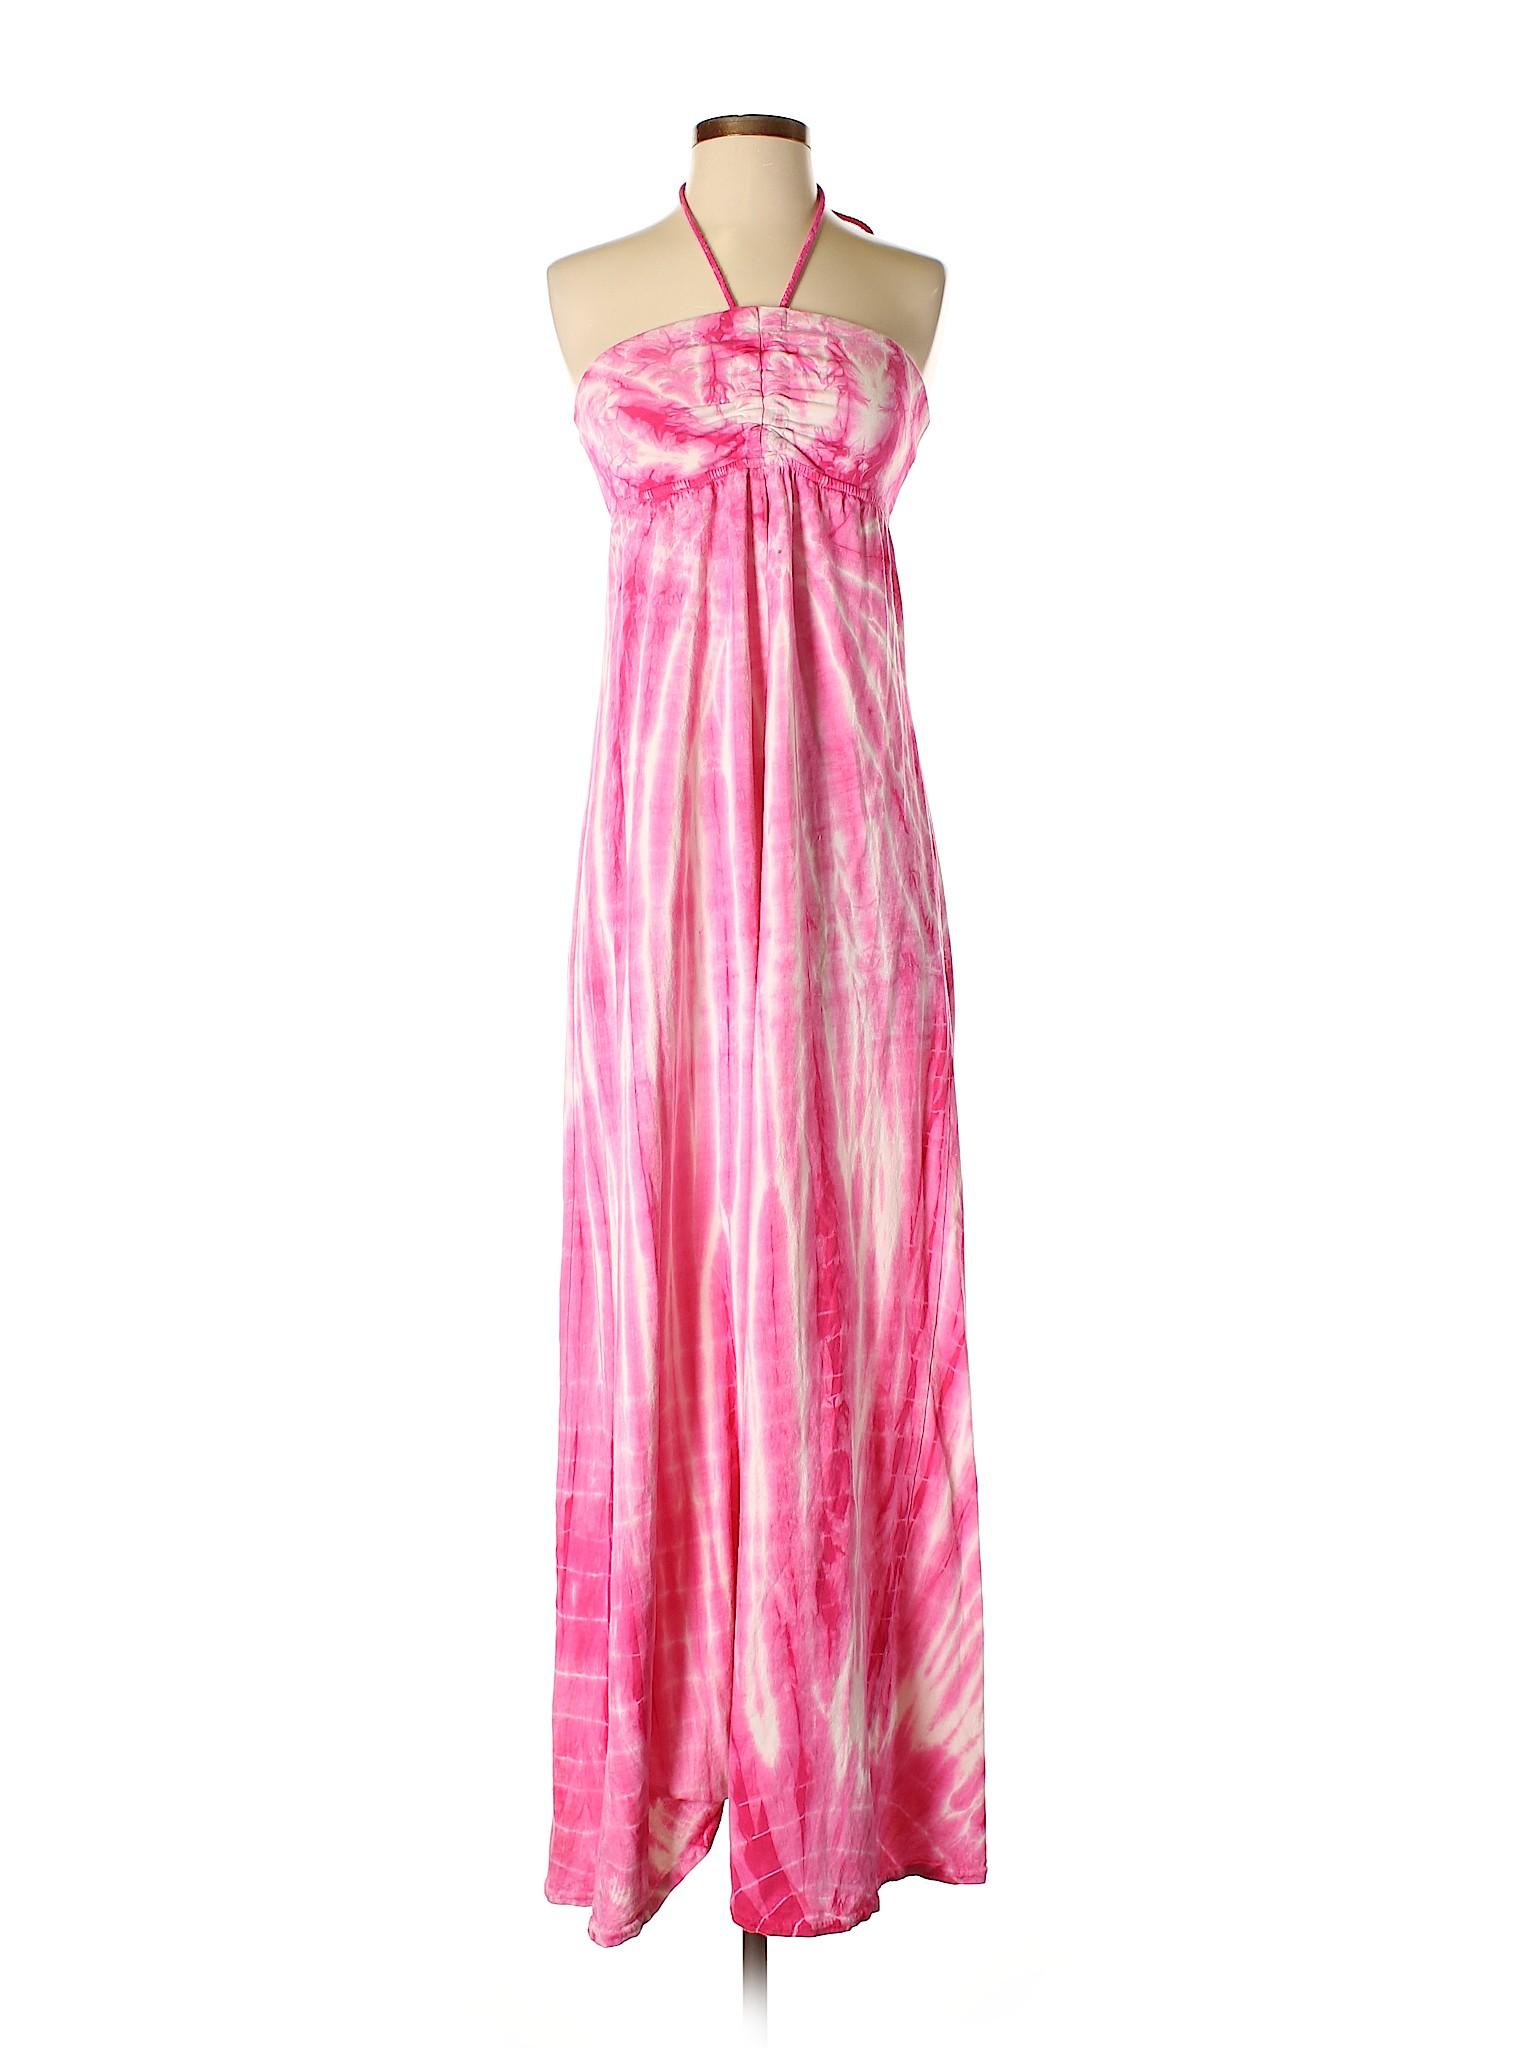 Dress Hard Selling Tail Hard Selling Casual apXwwEq5x